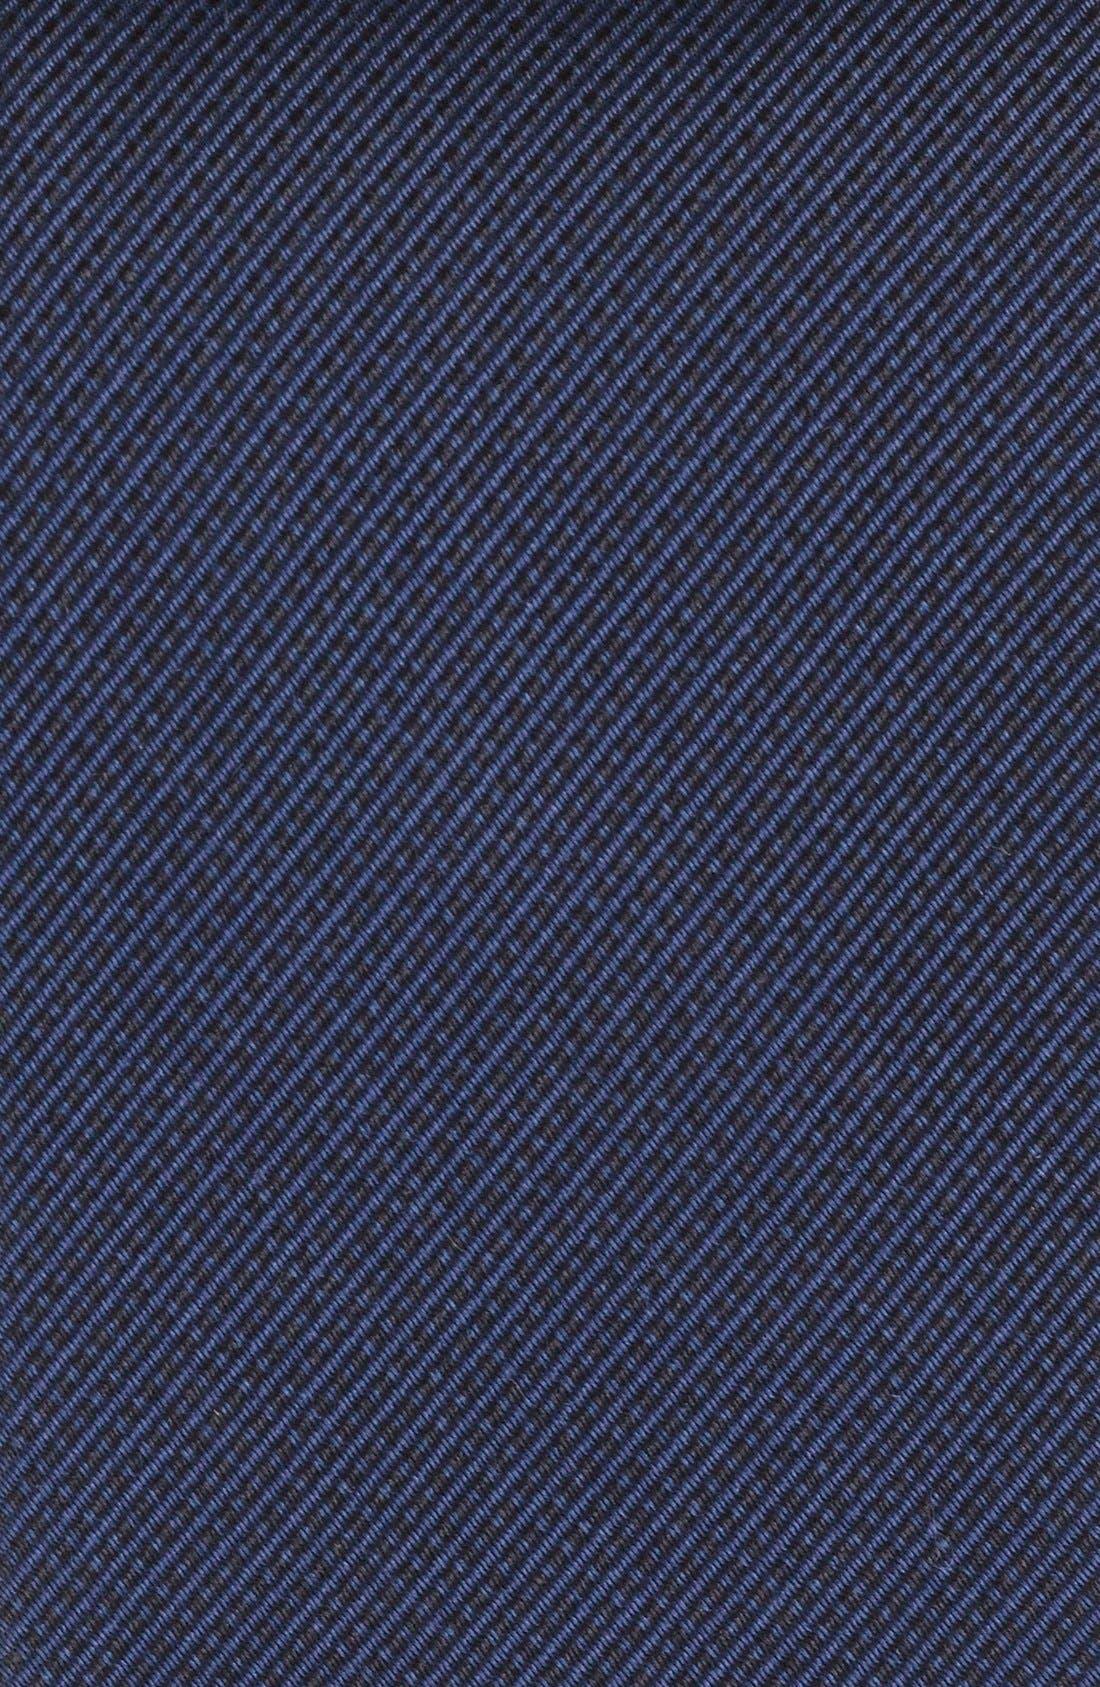 Alternate Image 2  - The Rail Silk Woven Tie